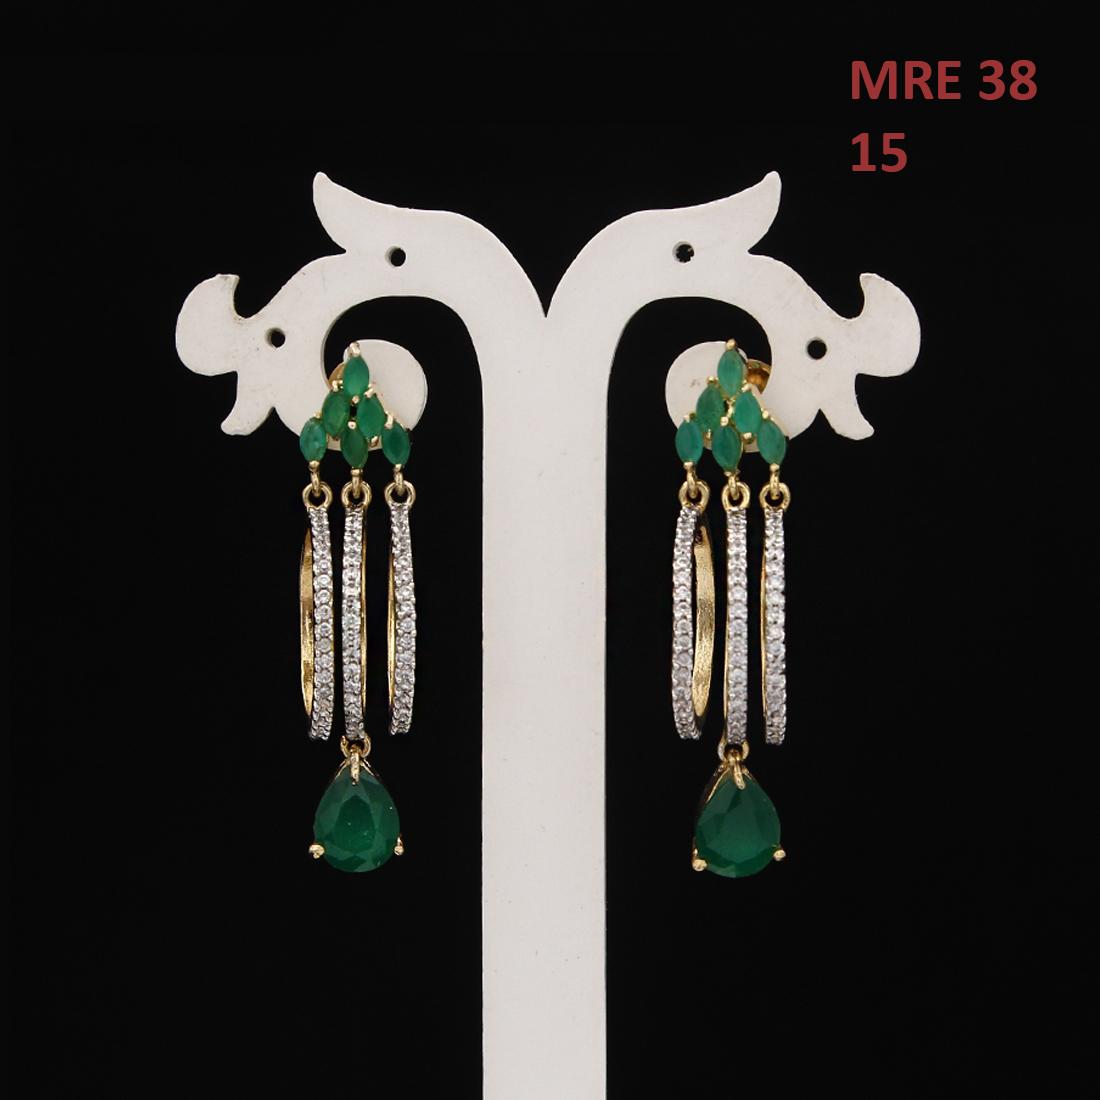 55Carat   Unique Ear Cuff Earrings For Women Girls Ladies Cubic Zircon Gold Plated Baali Kundal Jewellery Fashion Jewelry MRE 38